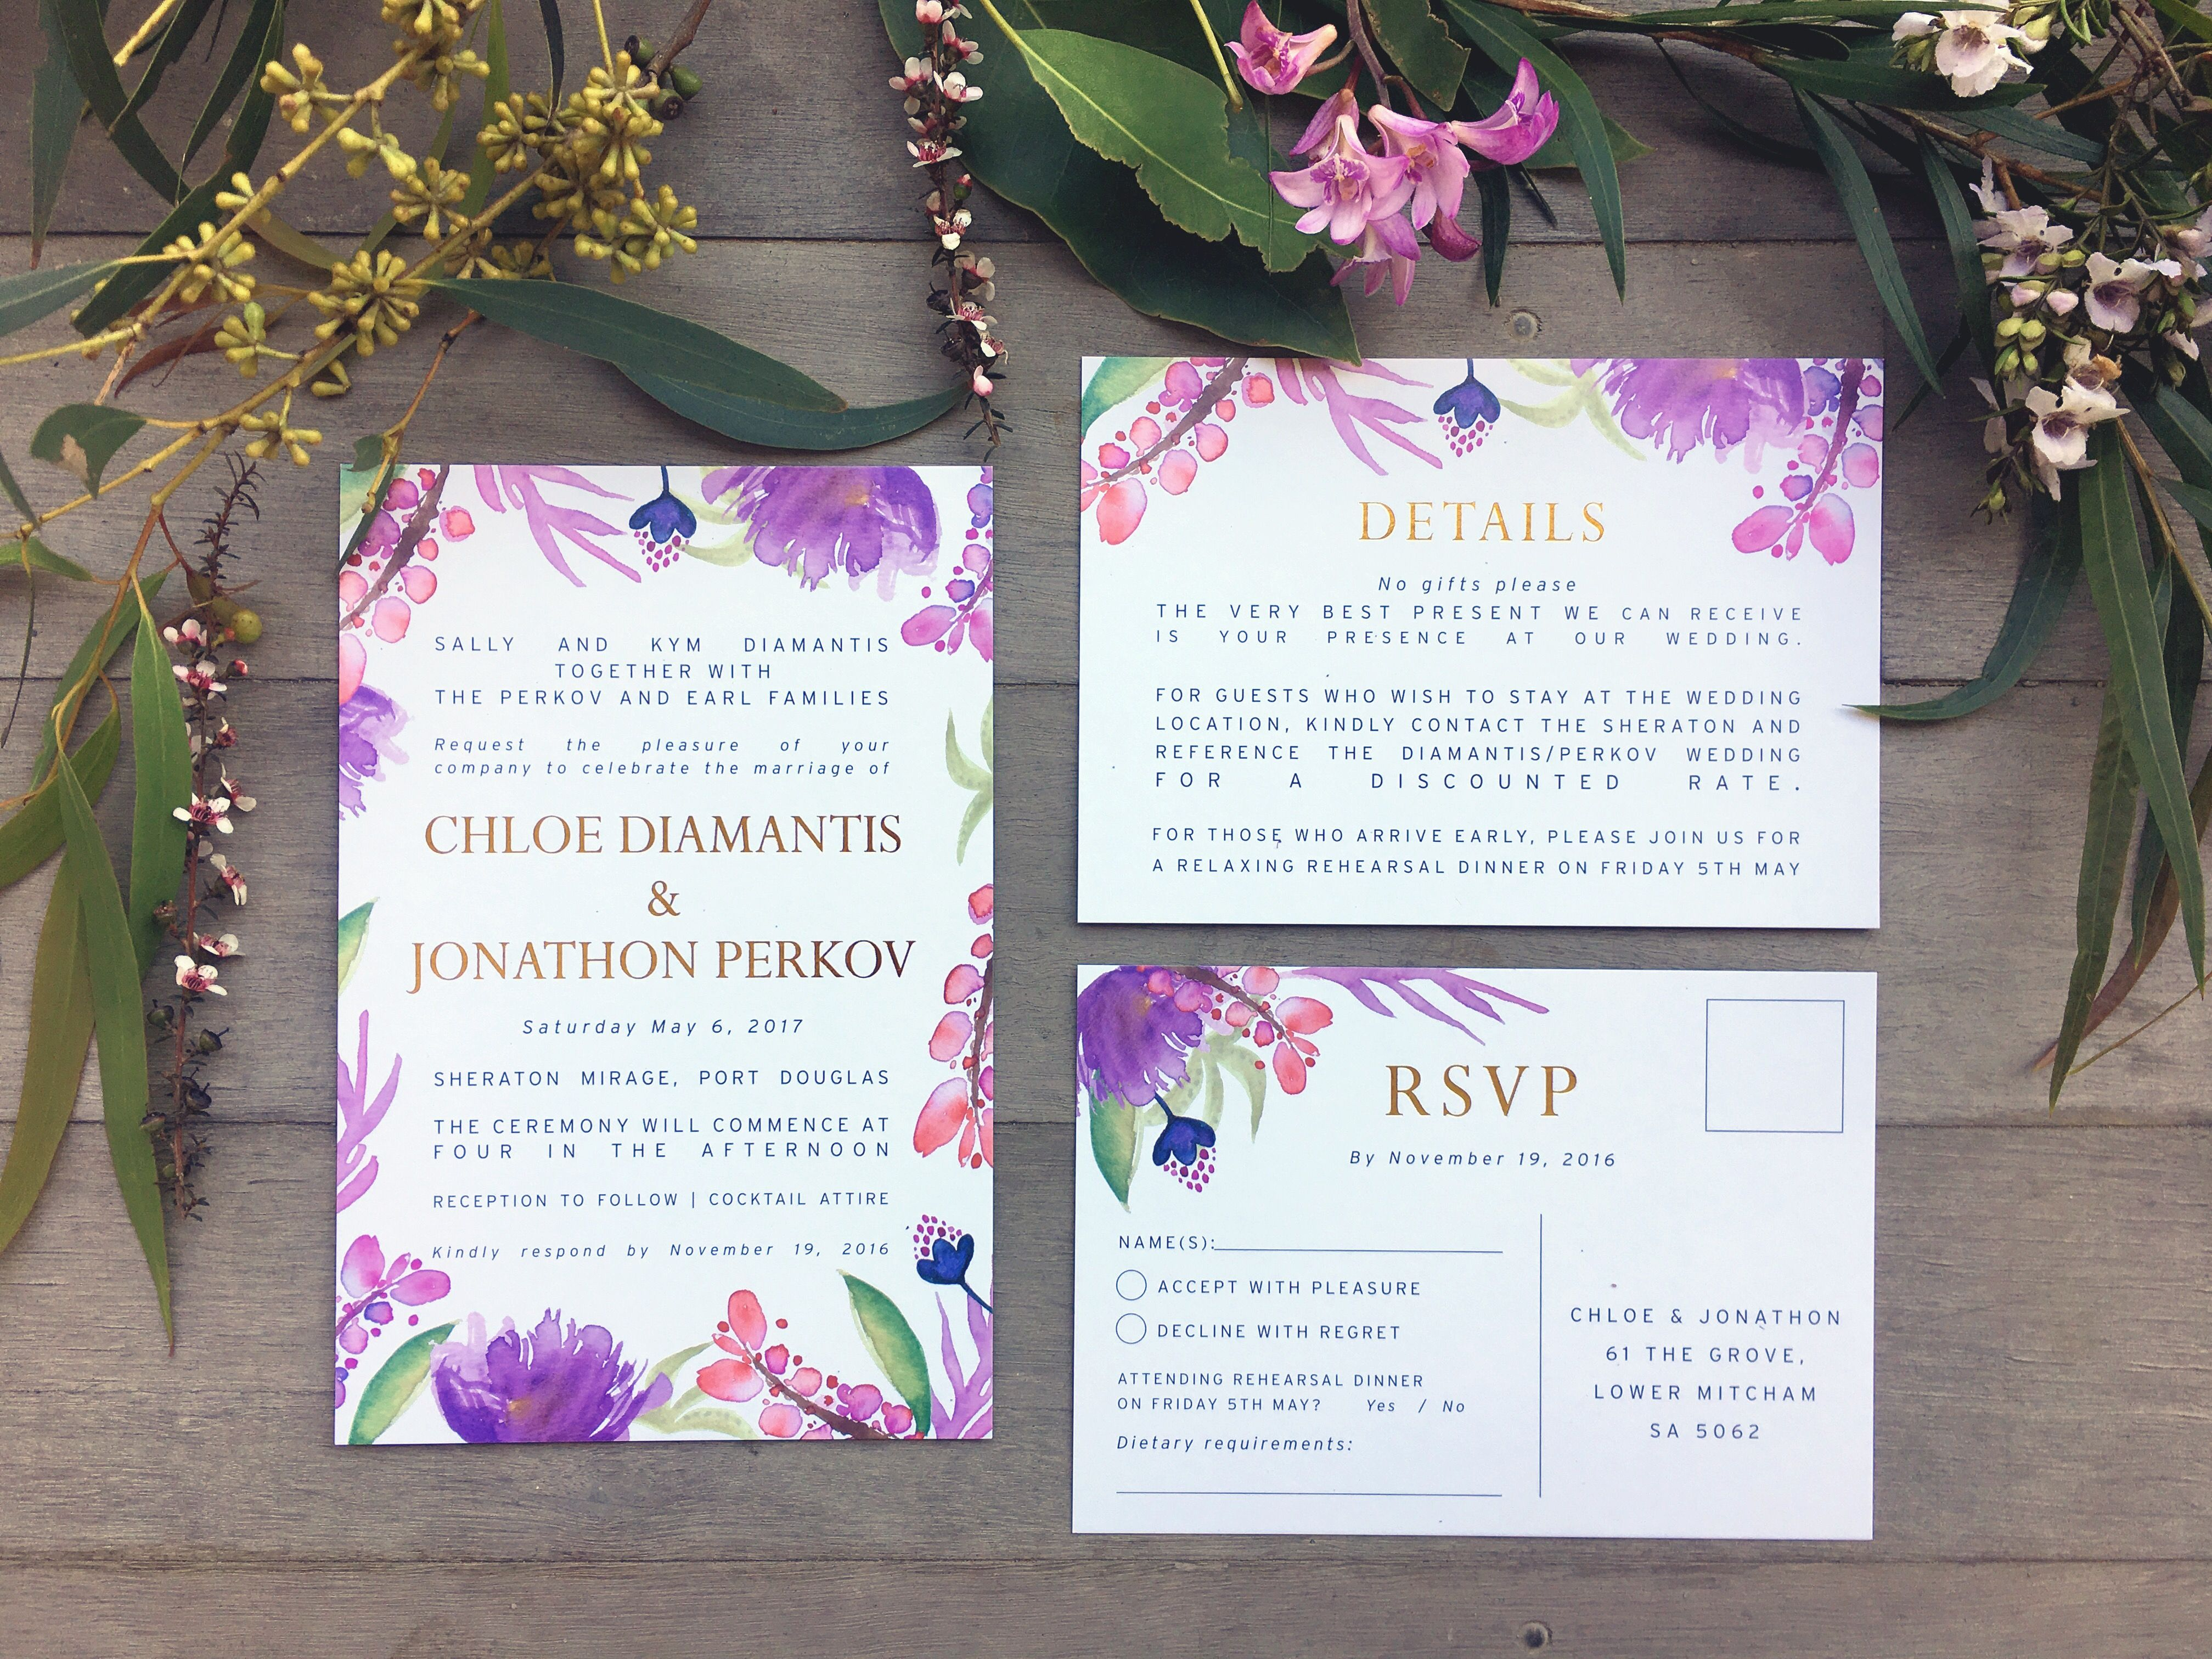 wedding invitation designs%0A Tropical purple island destination Hawaii Bali Fiji bora bora Maui  Queensland port Douglas gold foil RSVP    Invitation DesignBest QualityFiji Wedding